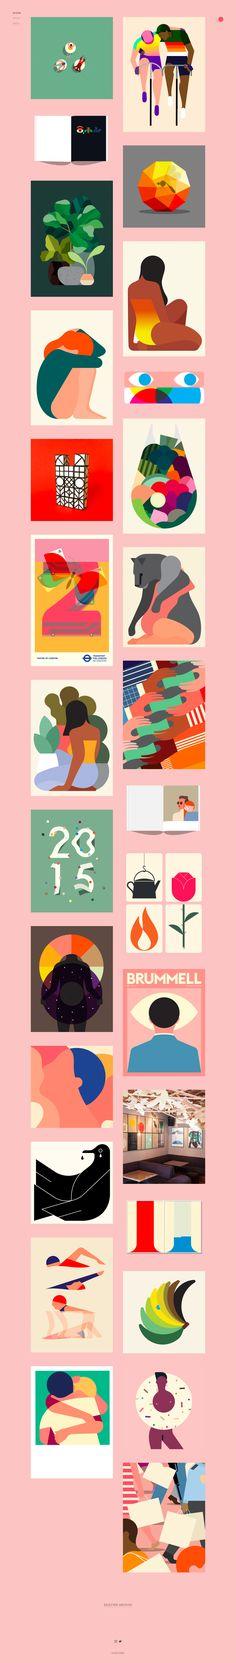 Rob Bailey Illustrations